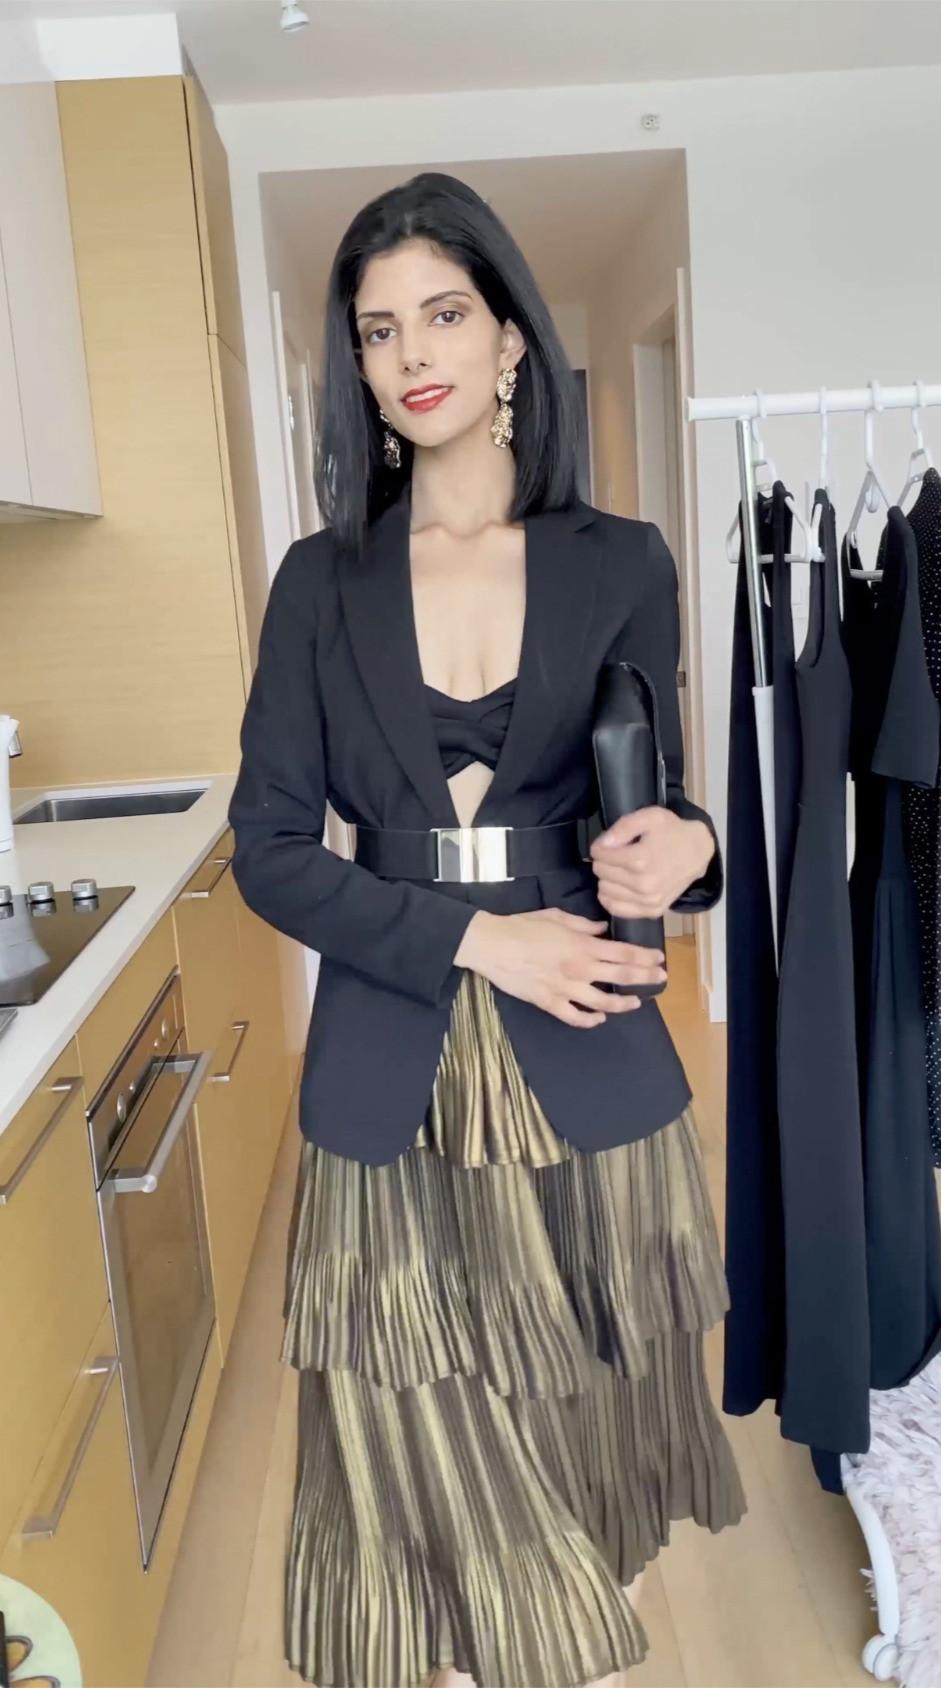 bandeau bikini top black pearl goddess pilyq Nimrit Sandhu